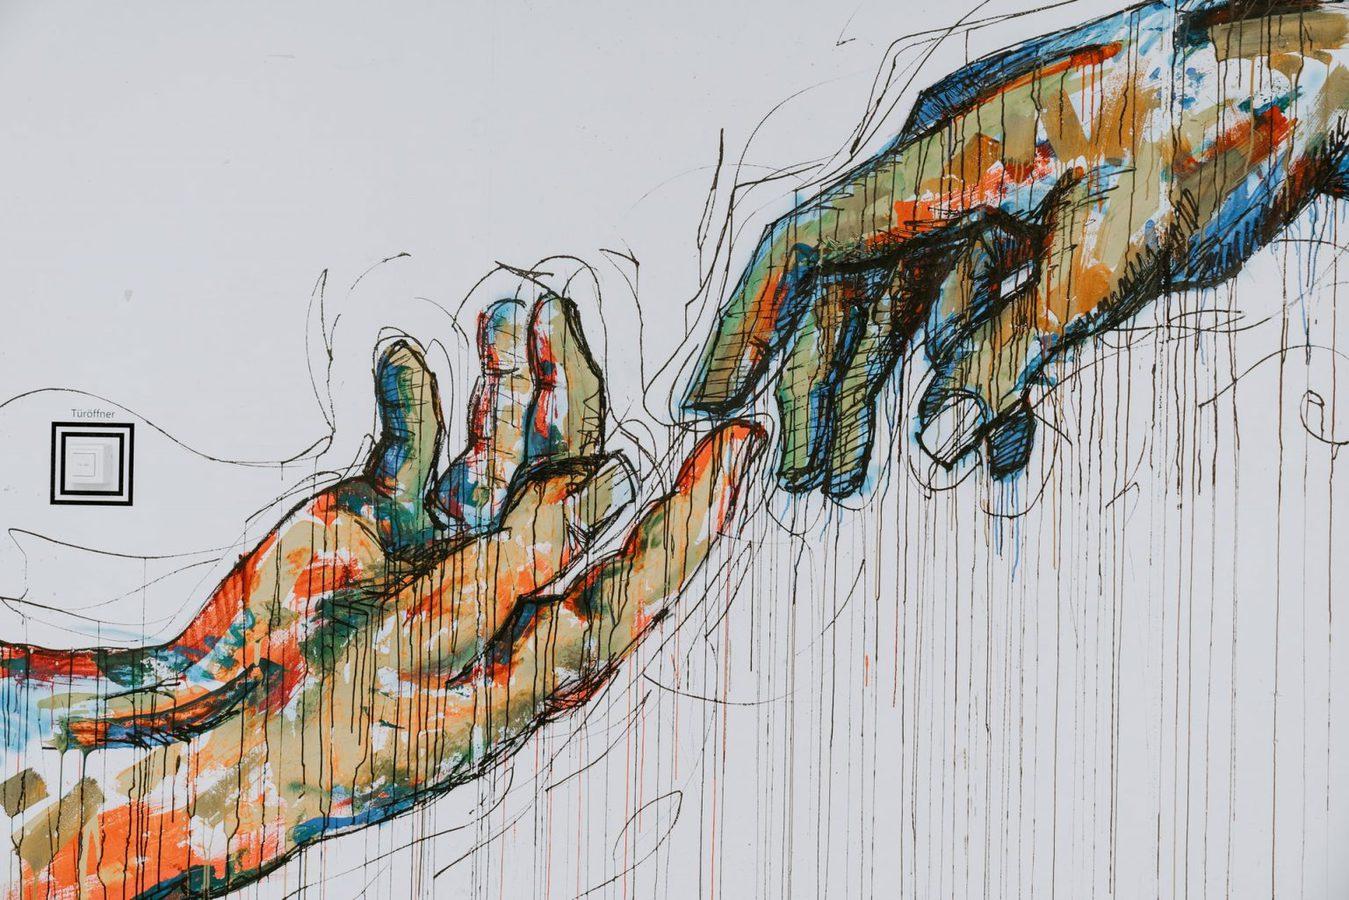 Davinci Touch-schilderij als kleurrijke graffiti